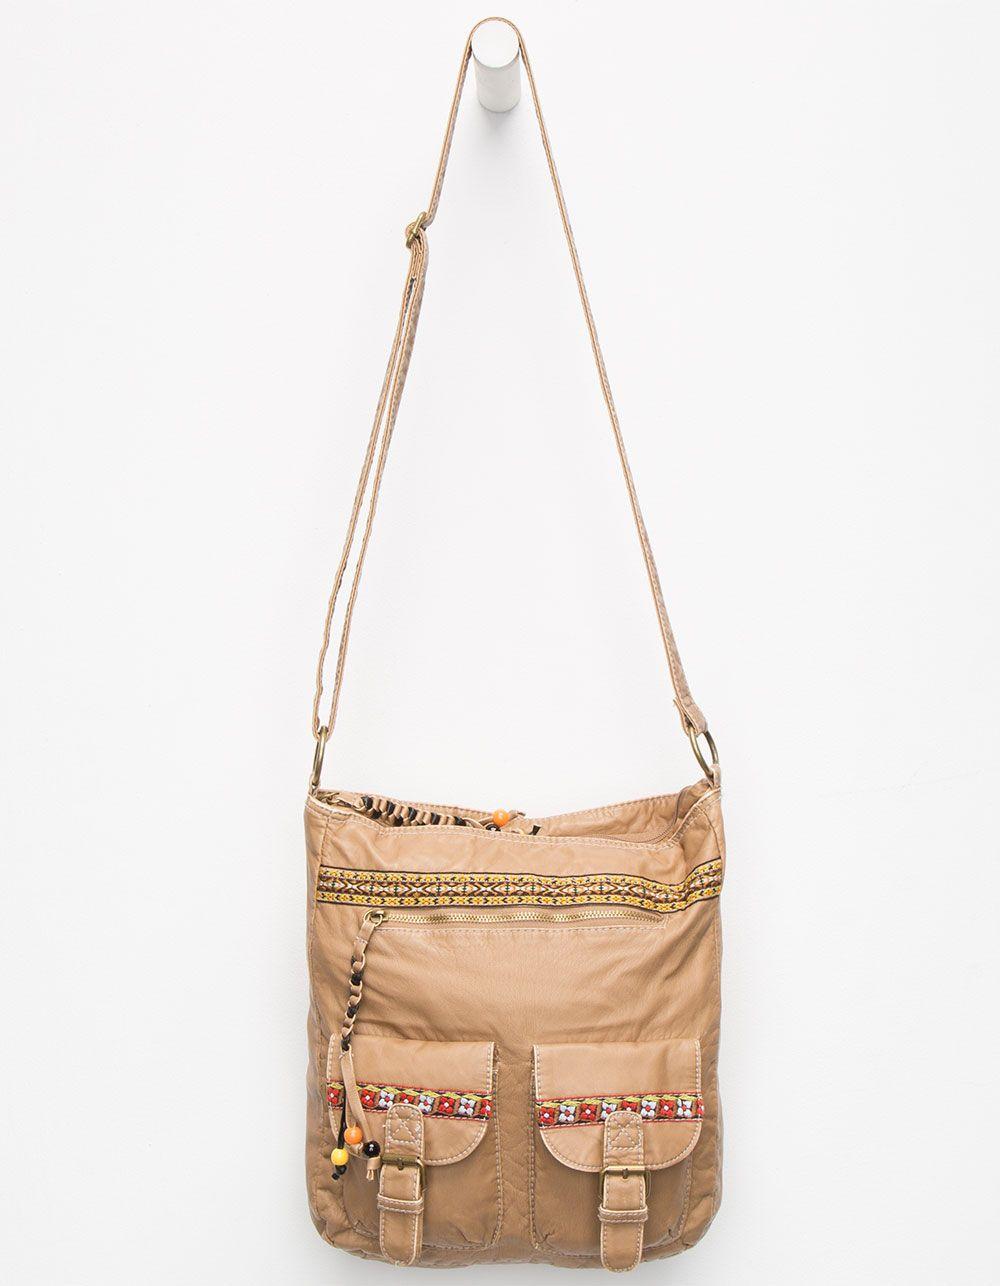 Ethnic Pocket Tote Bag 255972412 | Handbags